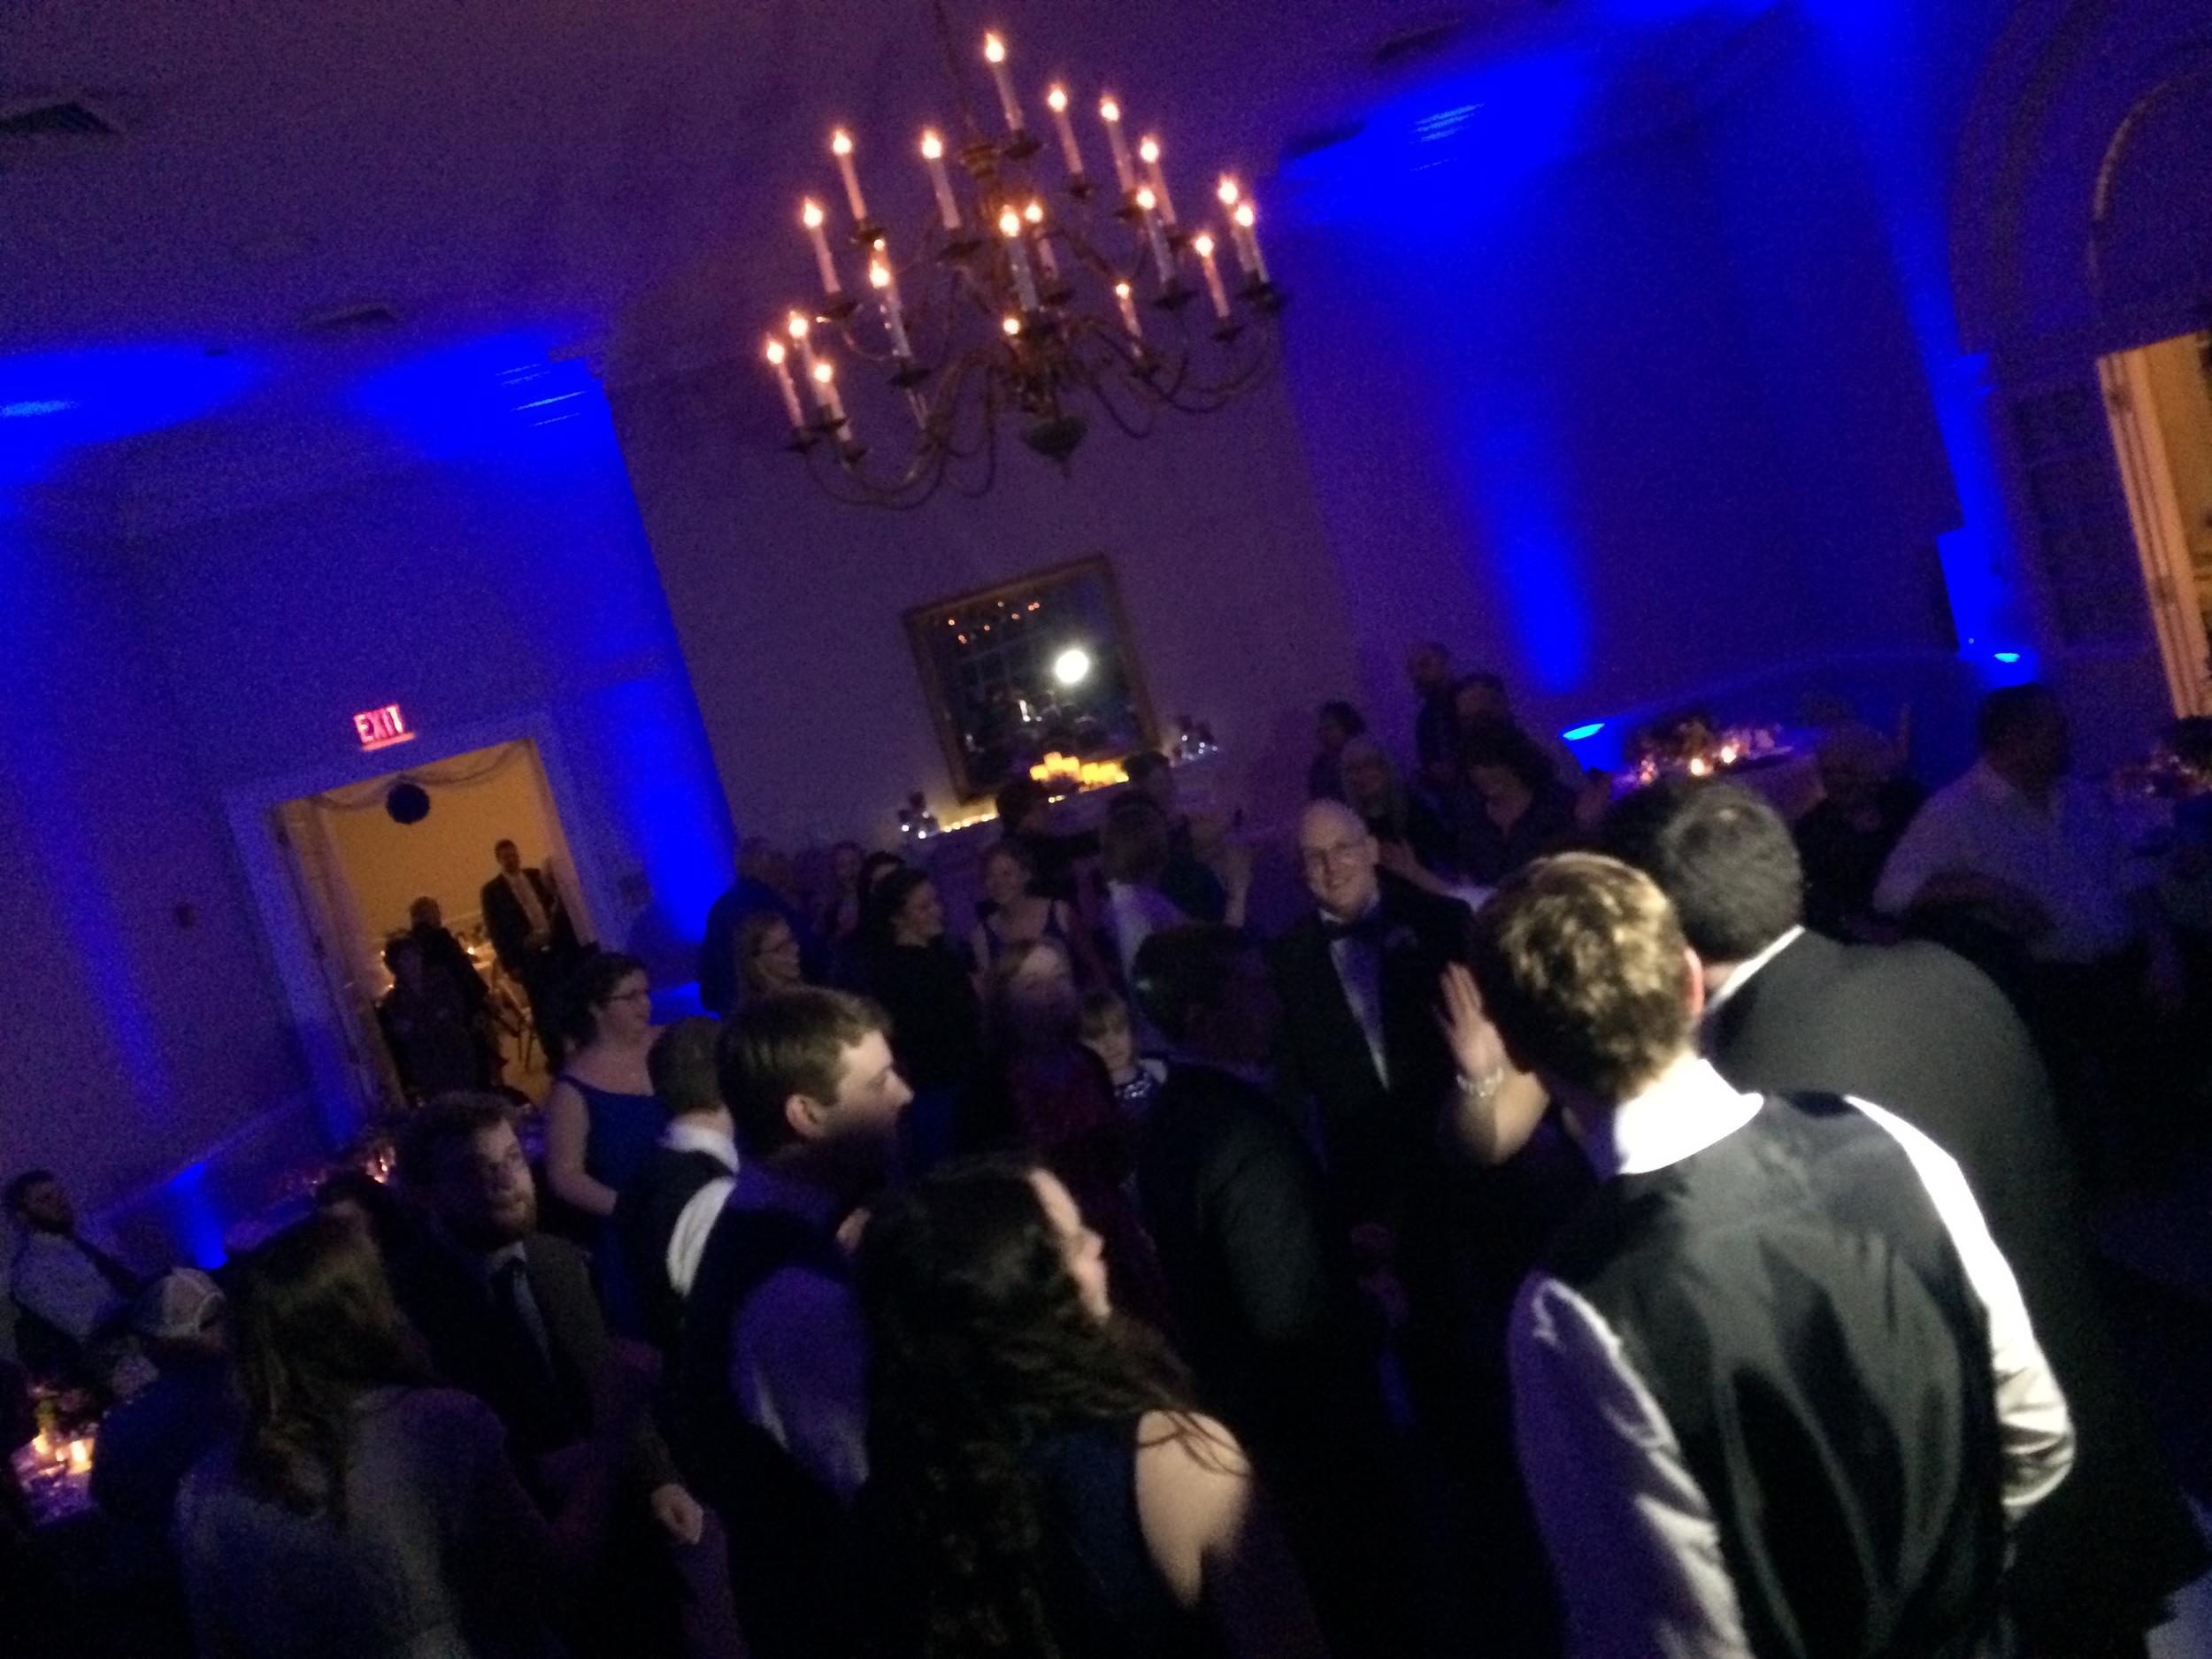 humphries-wedding-uplighting-dancing-party.jpg